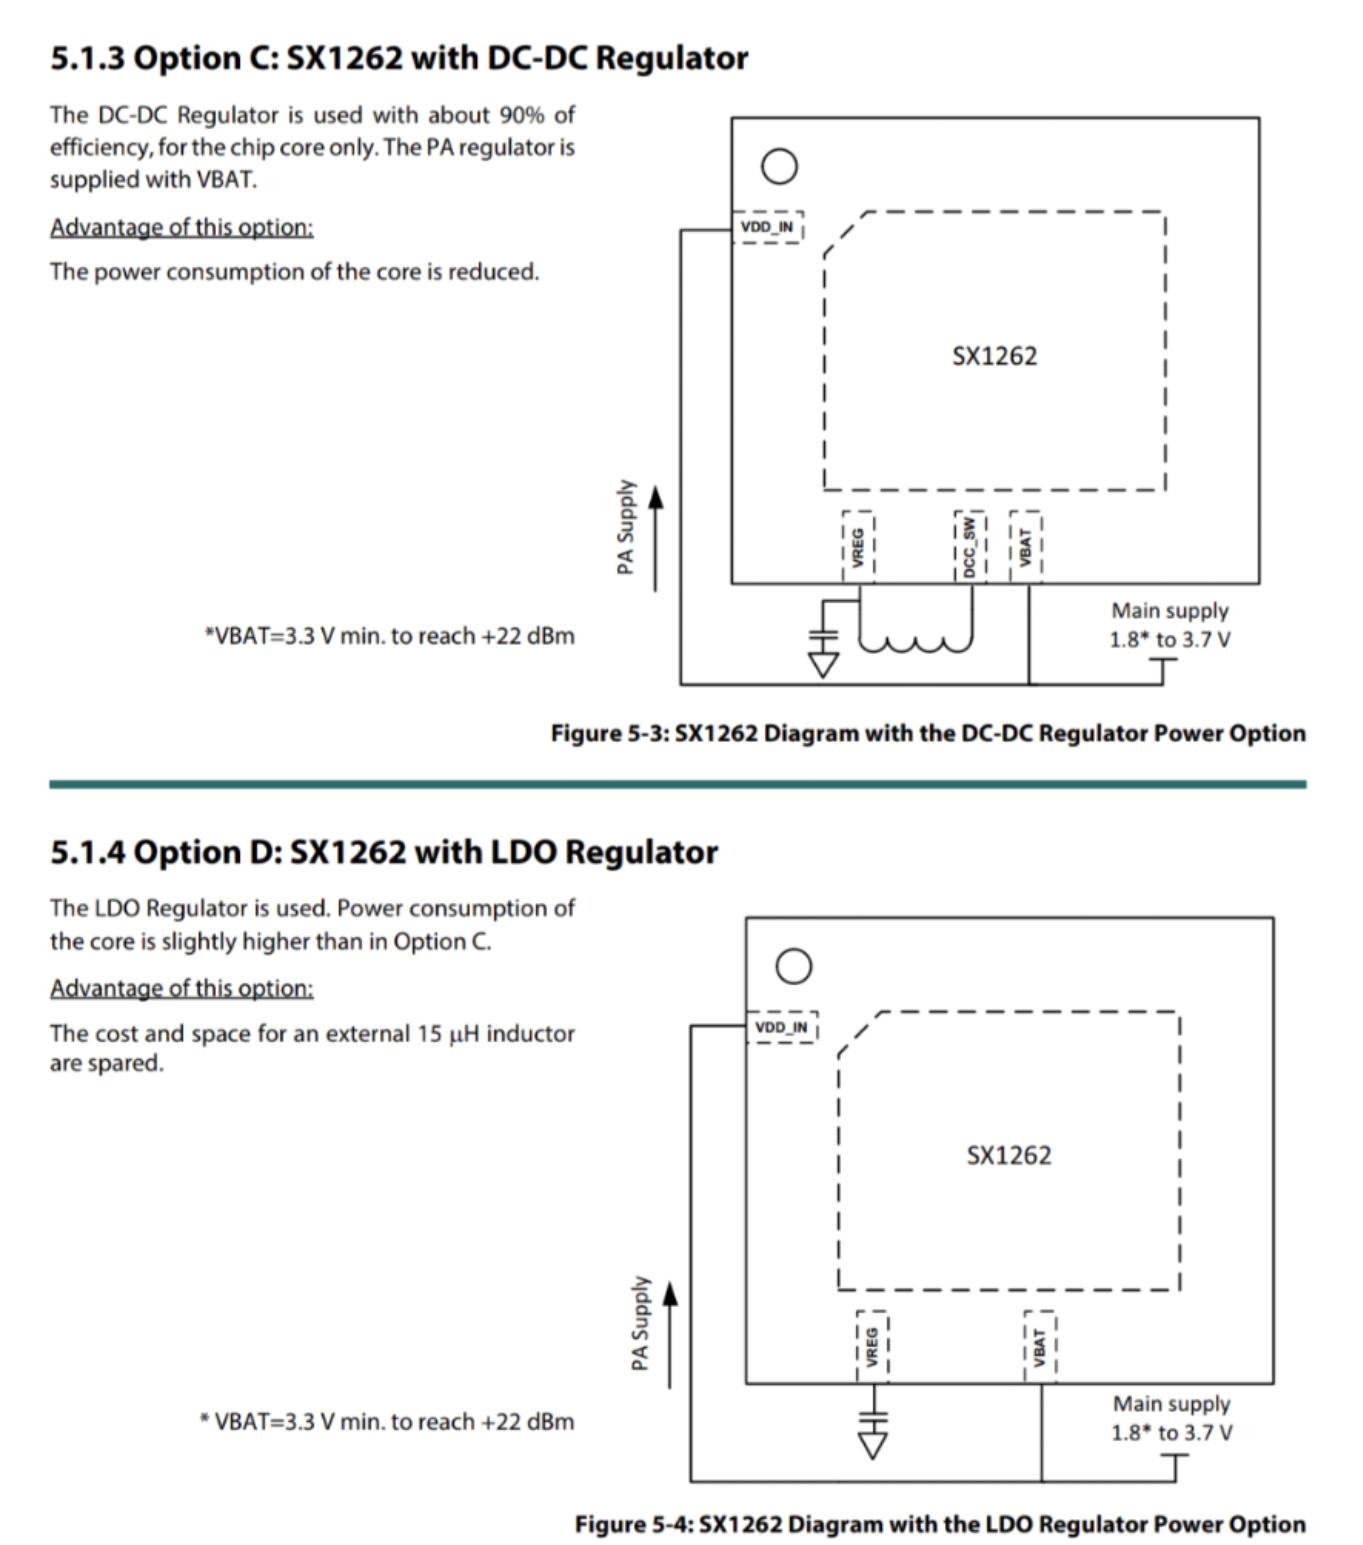 SX1262: DC-DC vs LDO